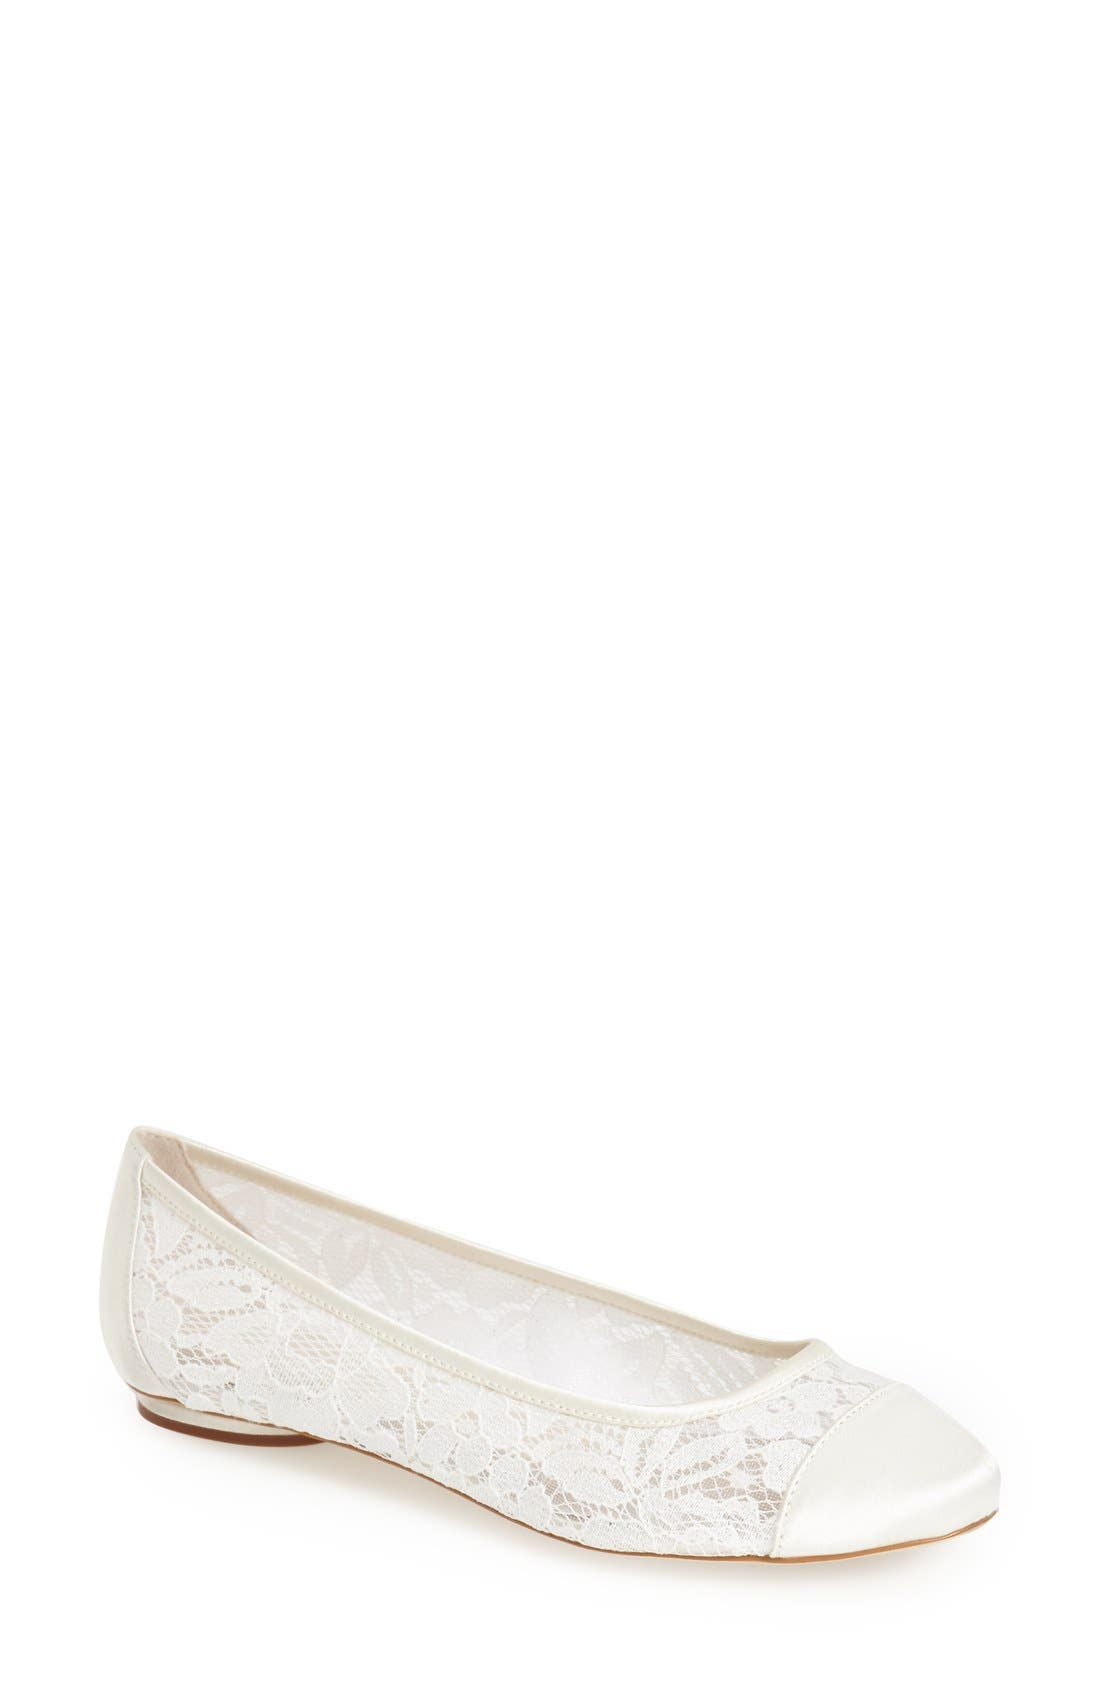 'Sweetie' Lace Cap Toe Ballet Flat,                         Main,                         color, Ivory Lace/ Mesh